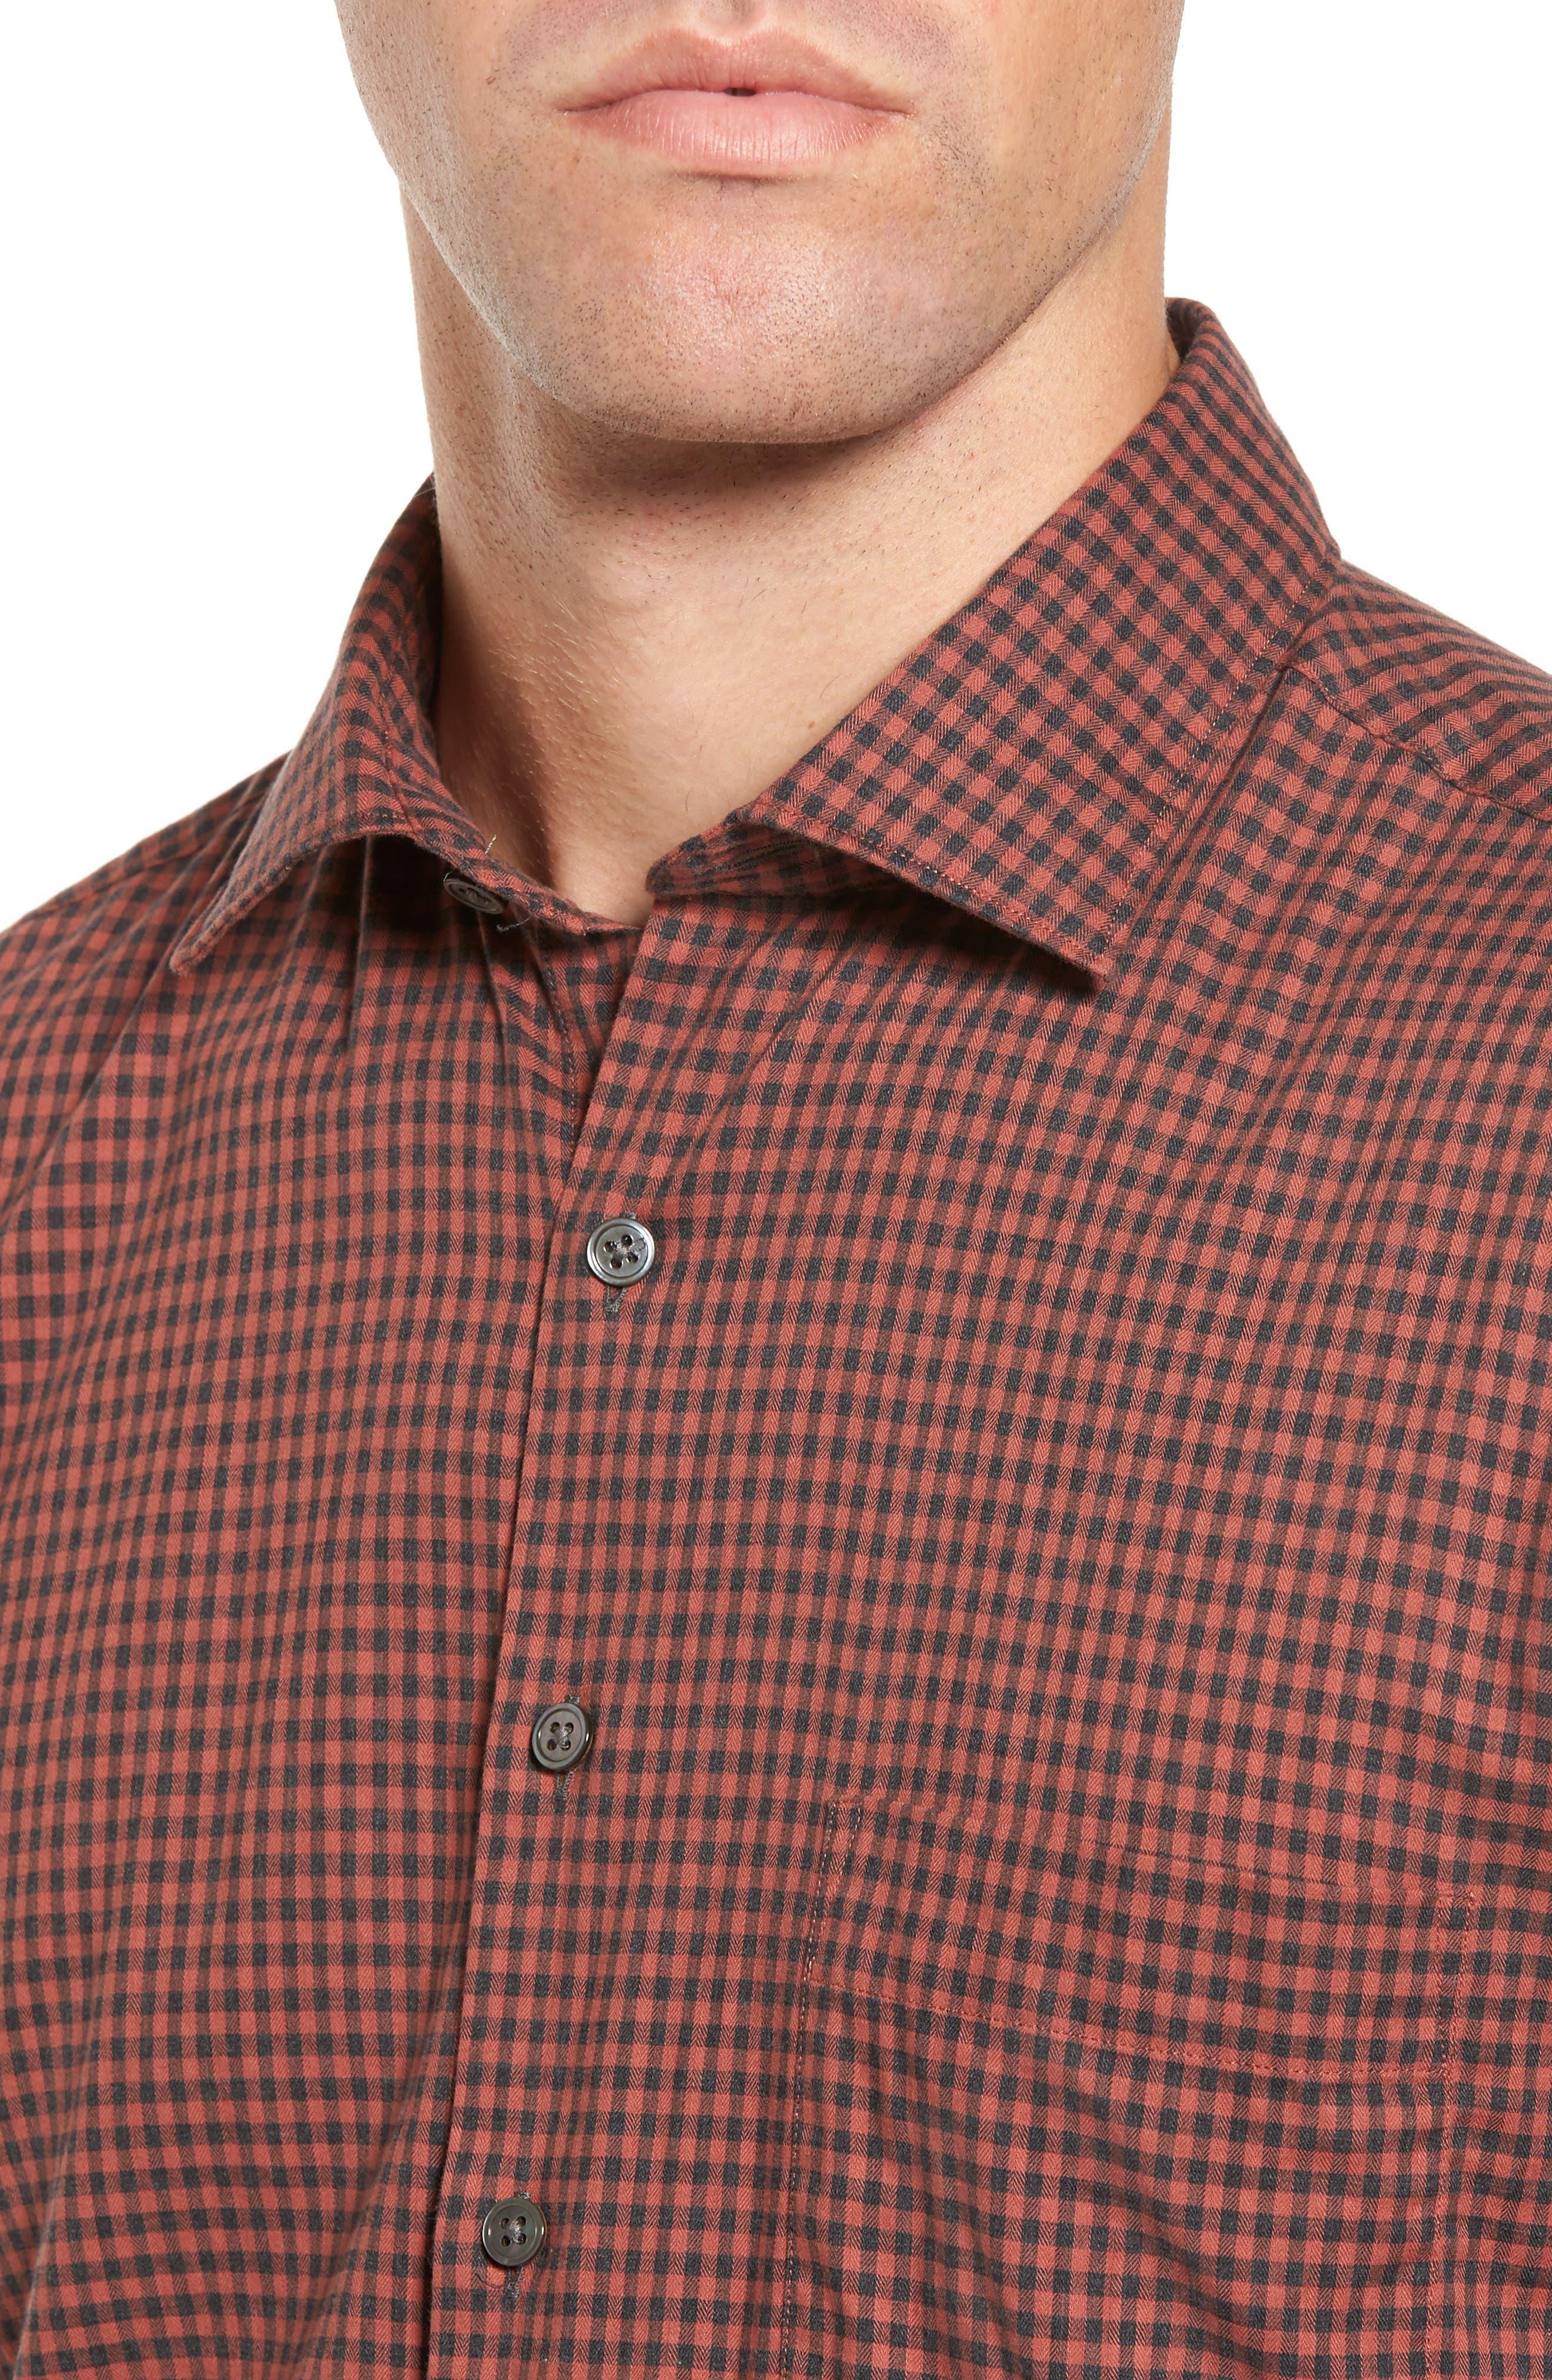 Halls Corner Check Sport Shirt,                             Alternate thumbnail 4, color,                             633